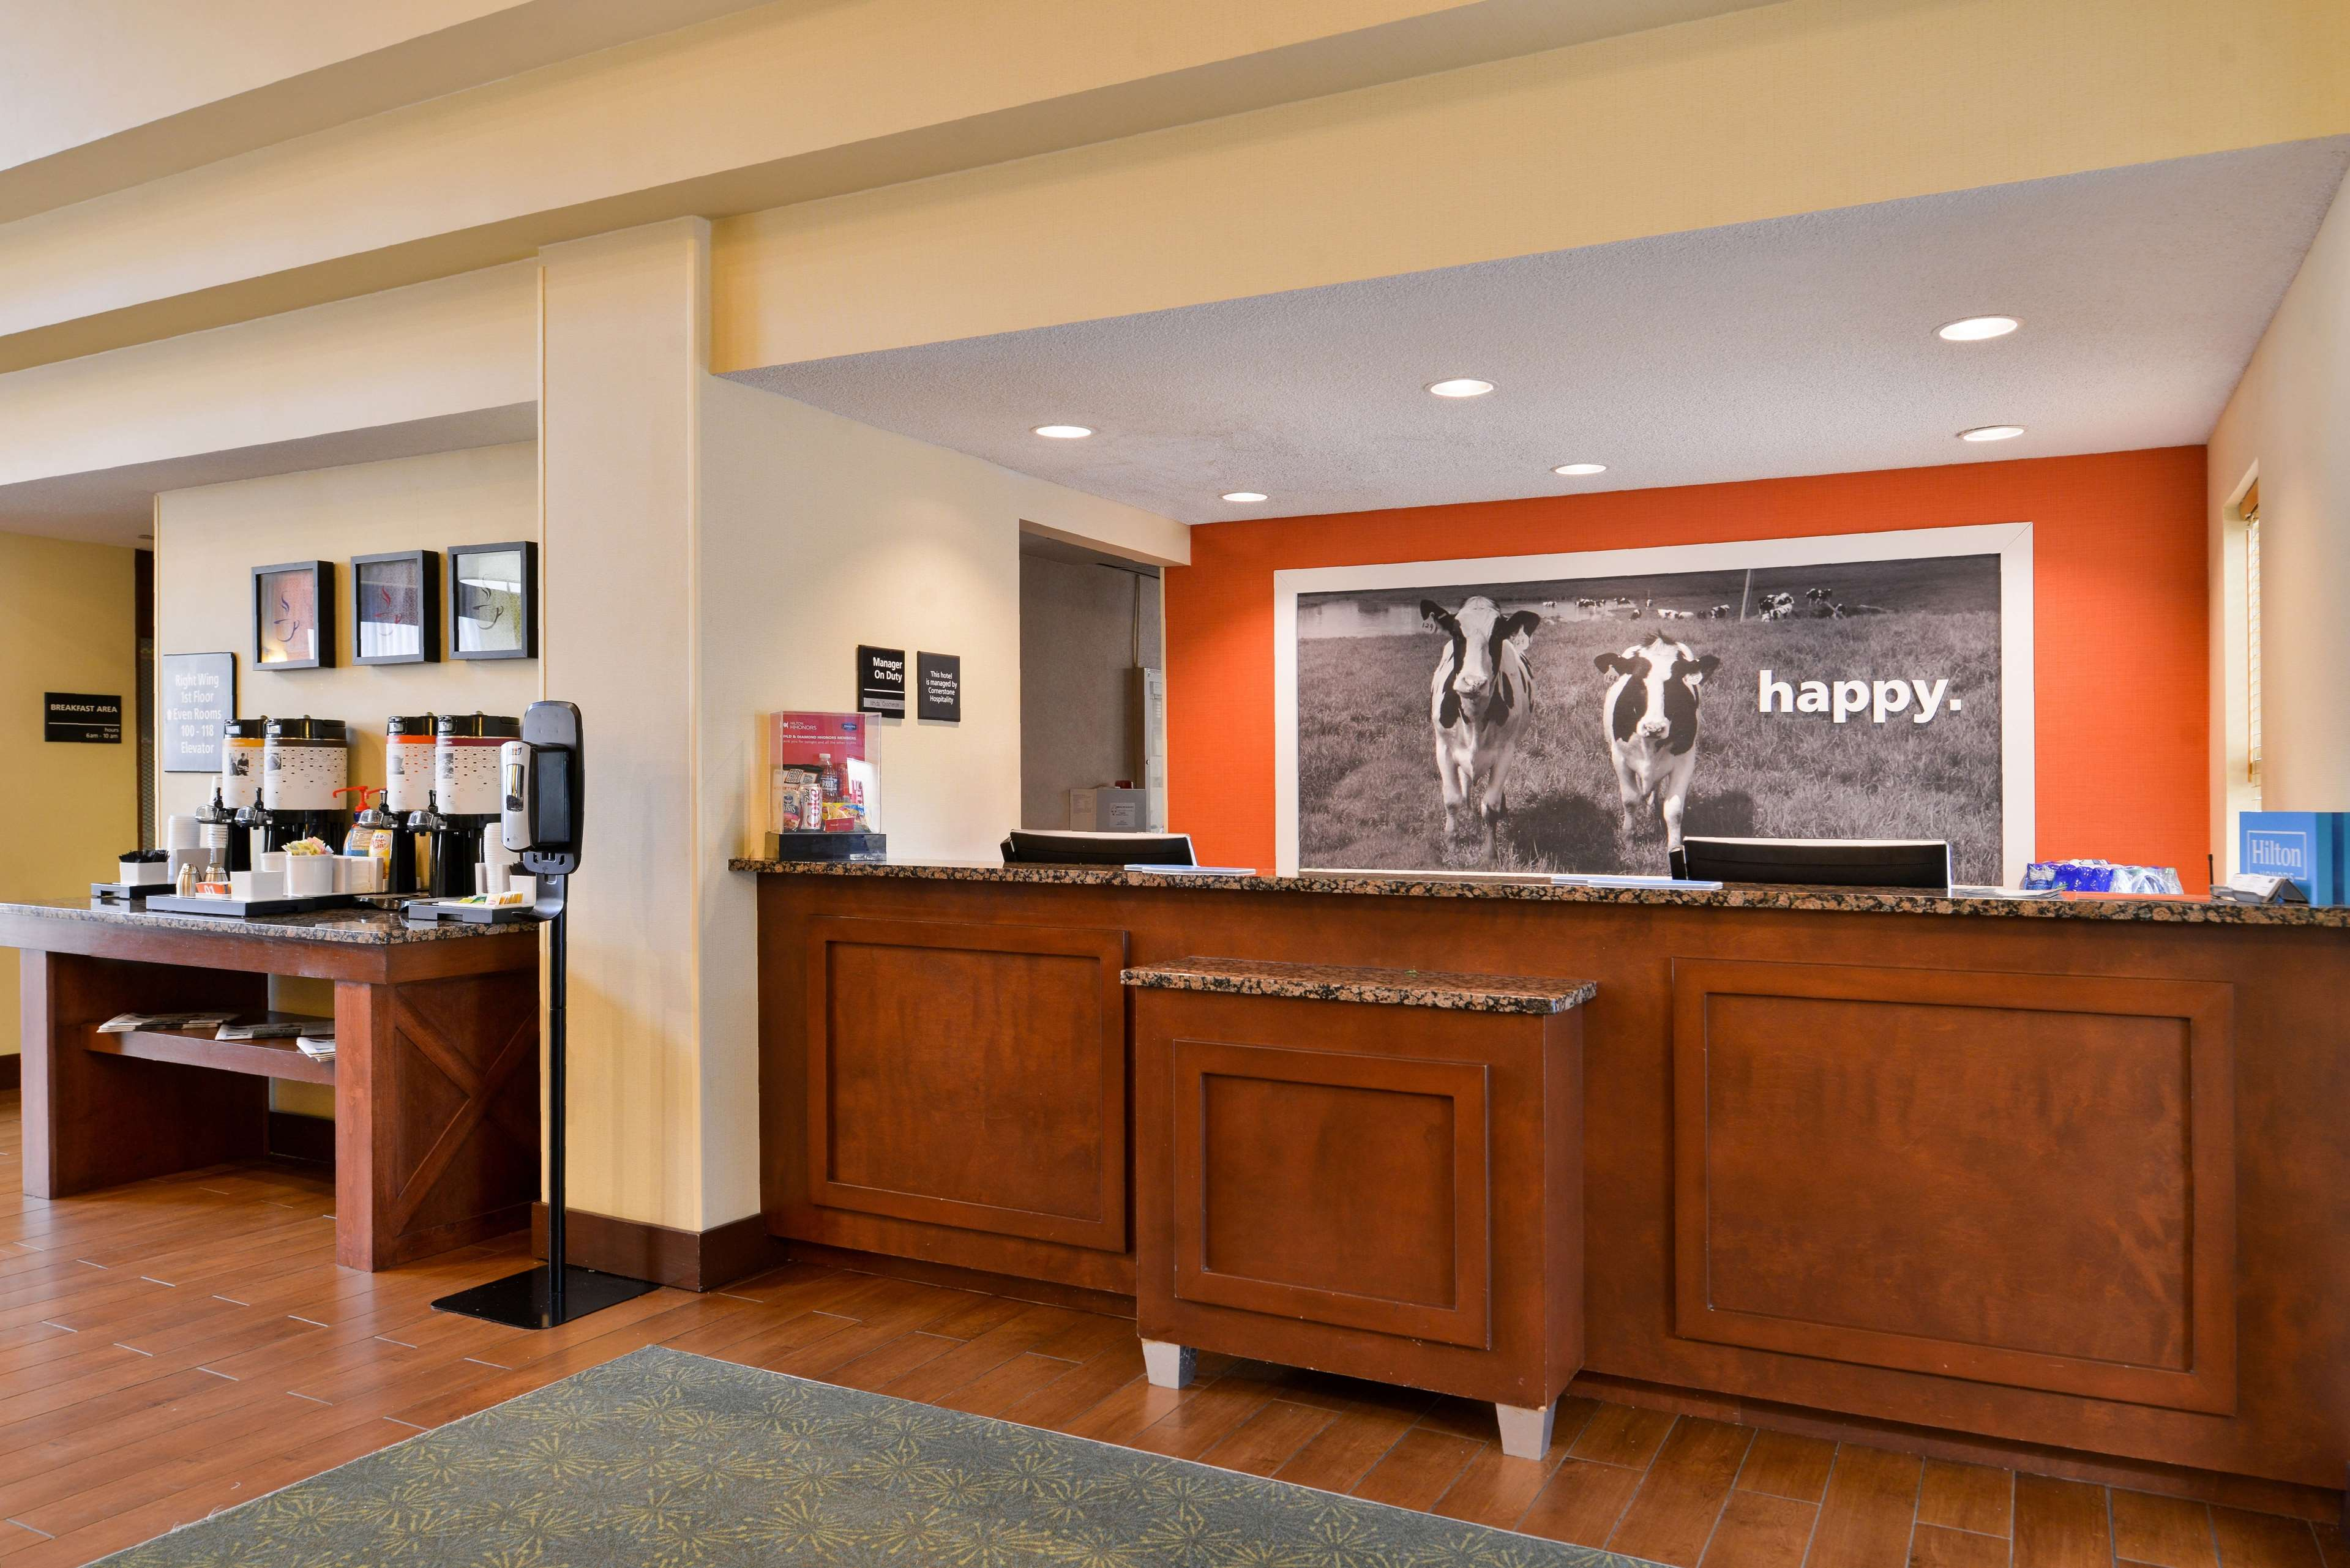 Hampton Inn & Suites Newport News (Oyster Point) image 6